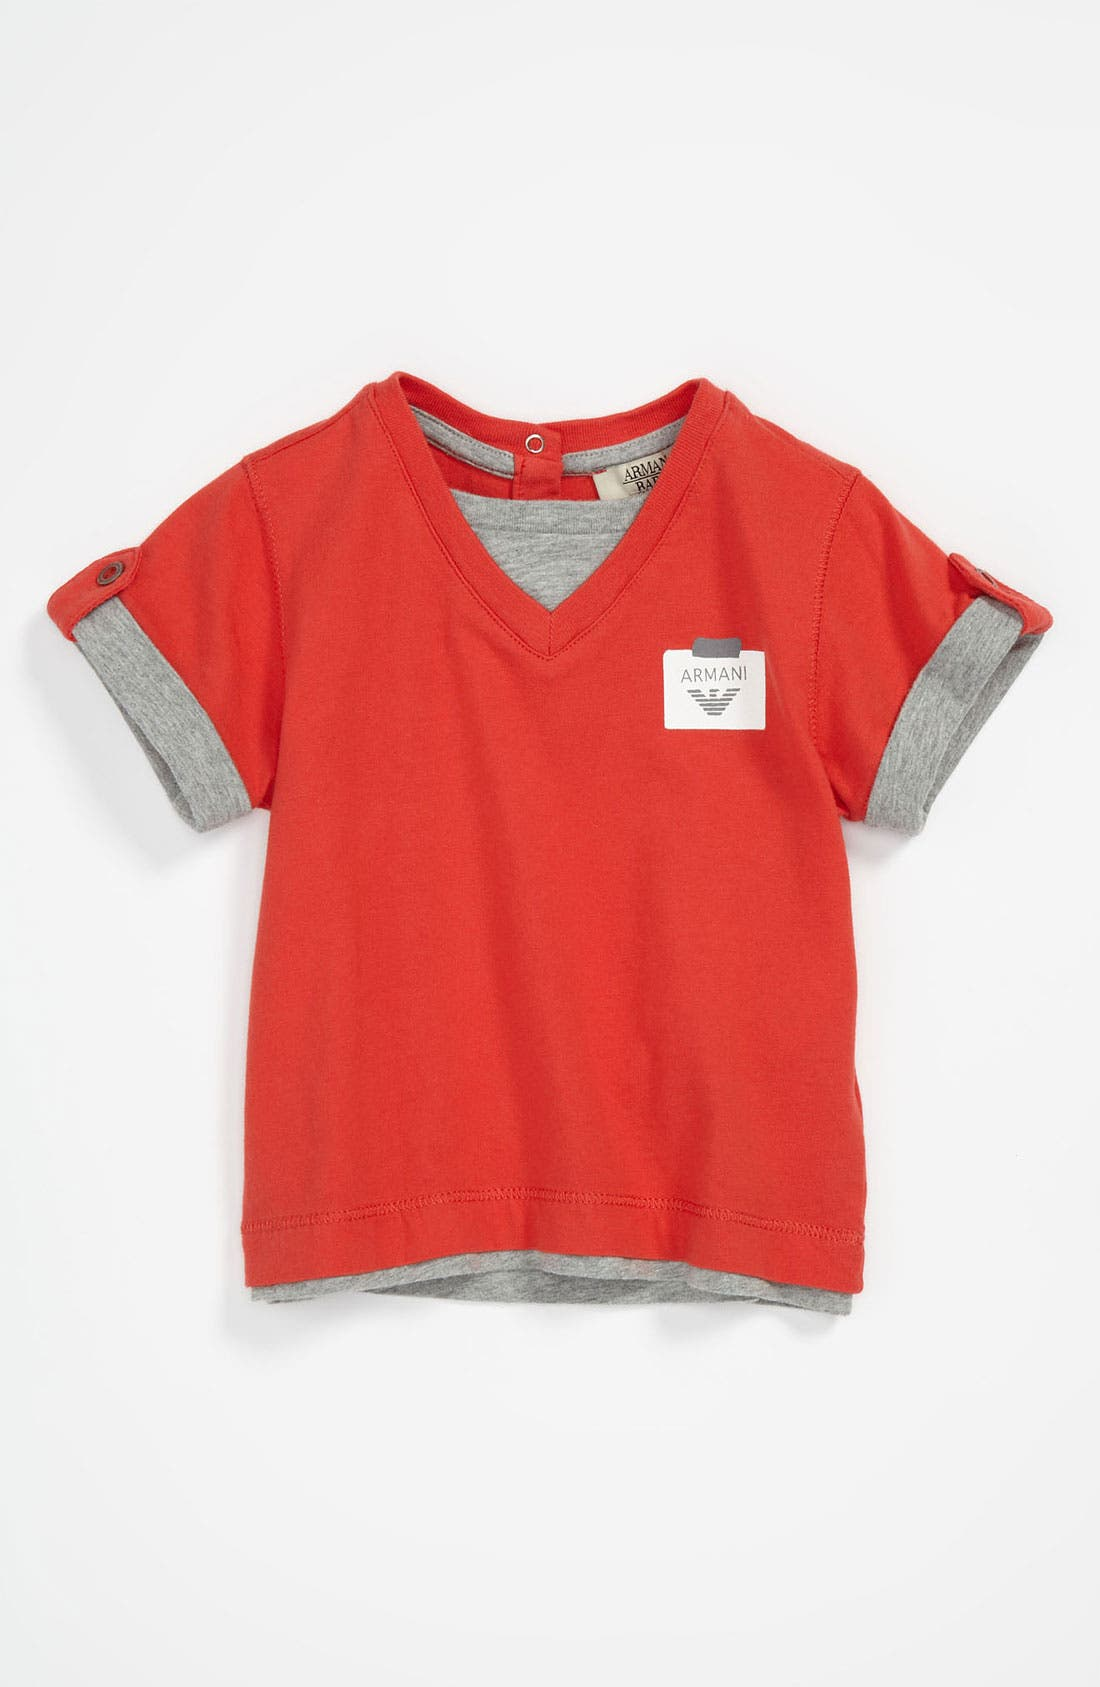 Alternate Image 1 Selected - Armani Junior T-Shirt (Baby)